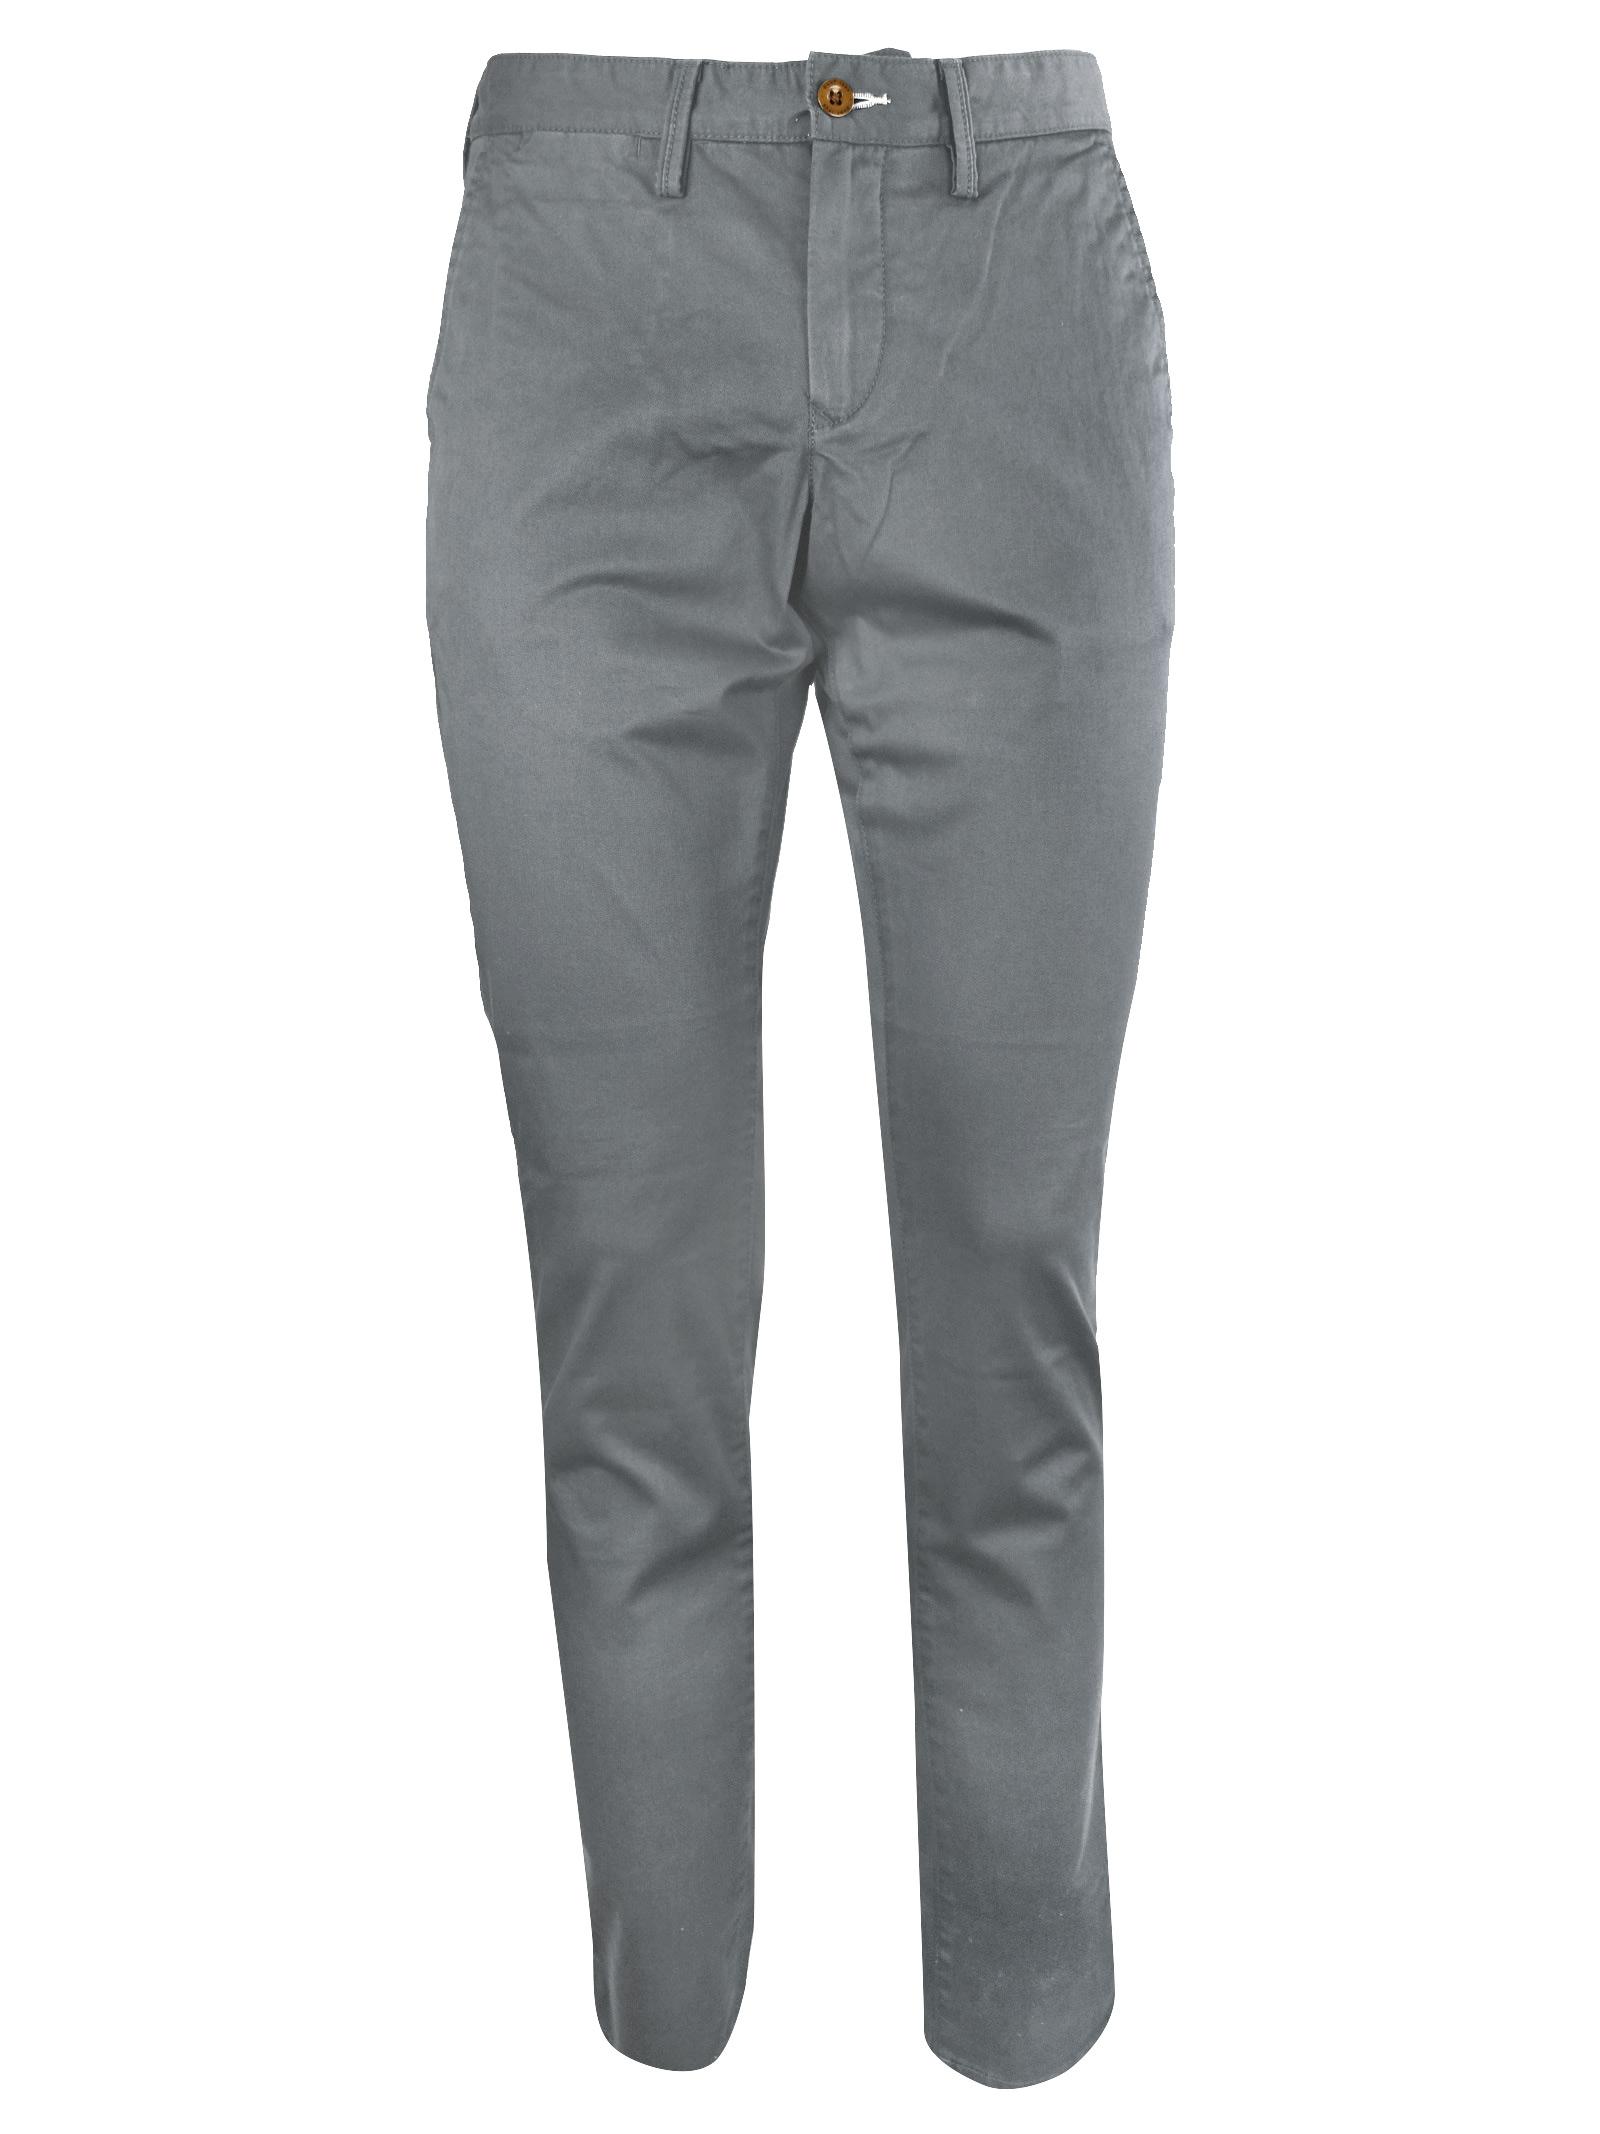 Arley desert chinos GANT | Trousers | 150015636